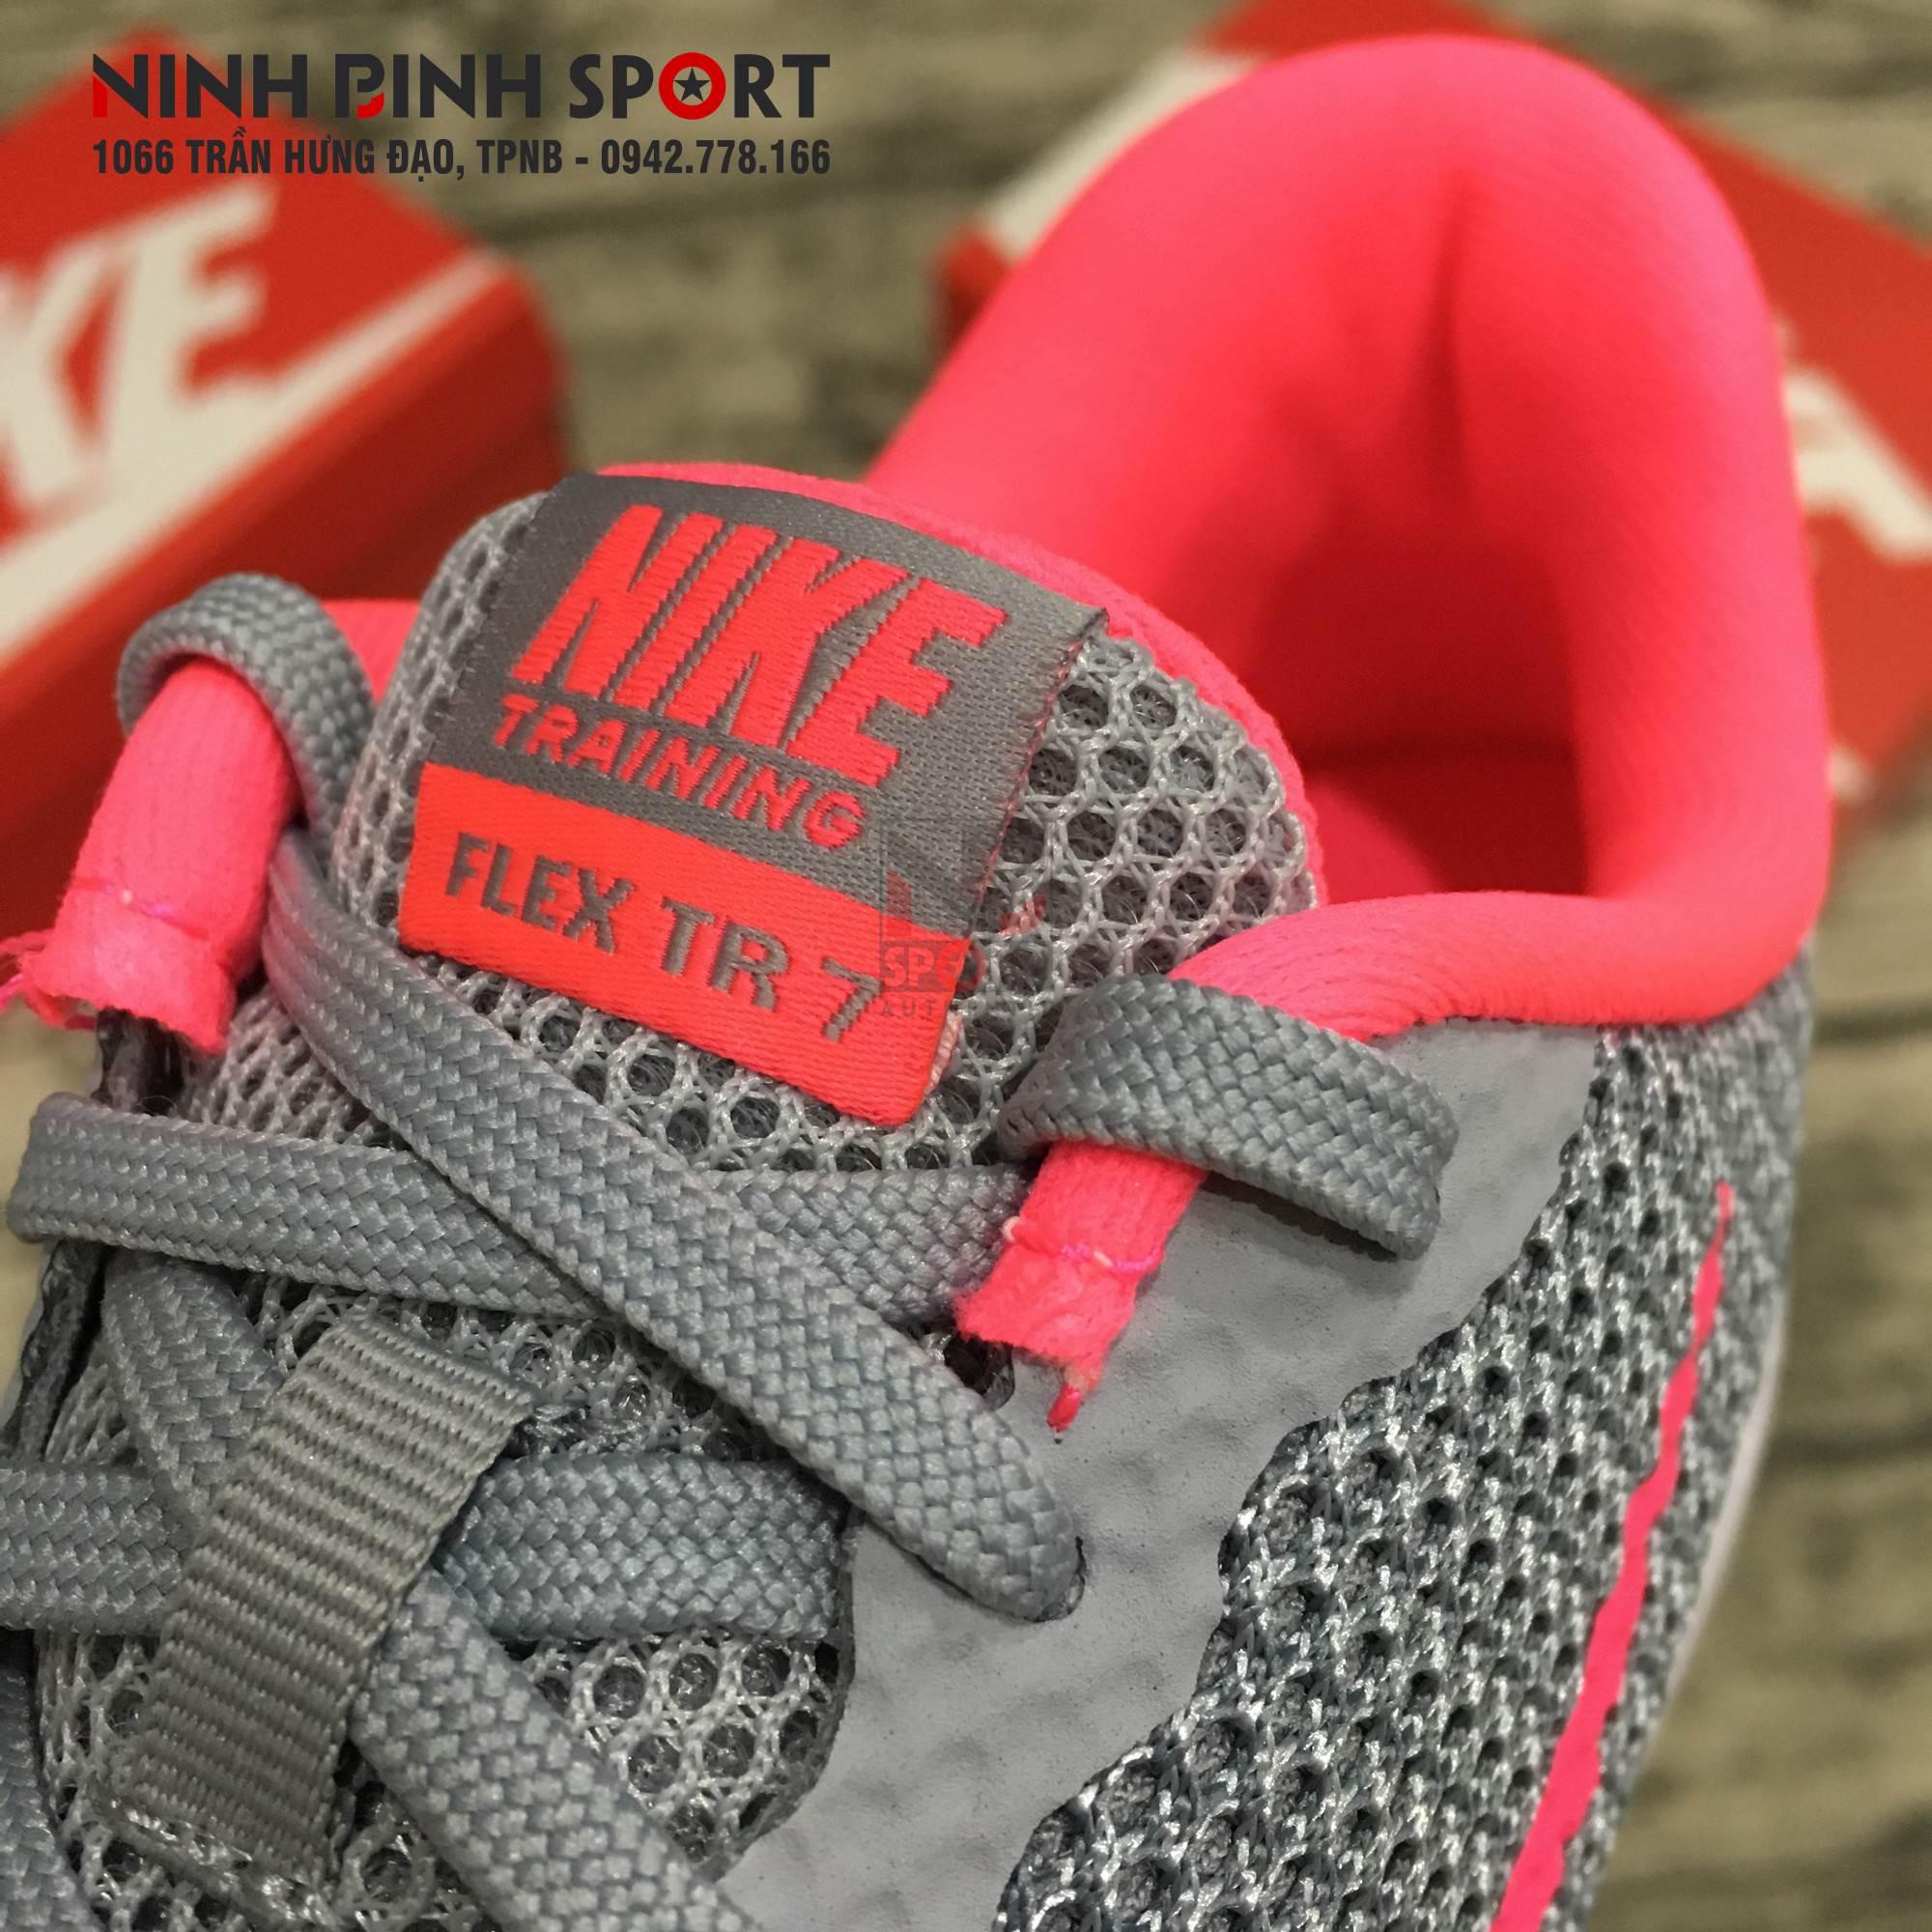 Giày thể thao nữ Nike Flex Trainer 898479-006